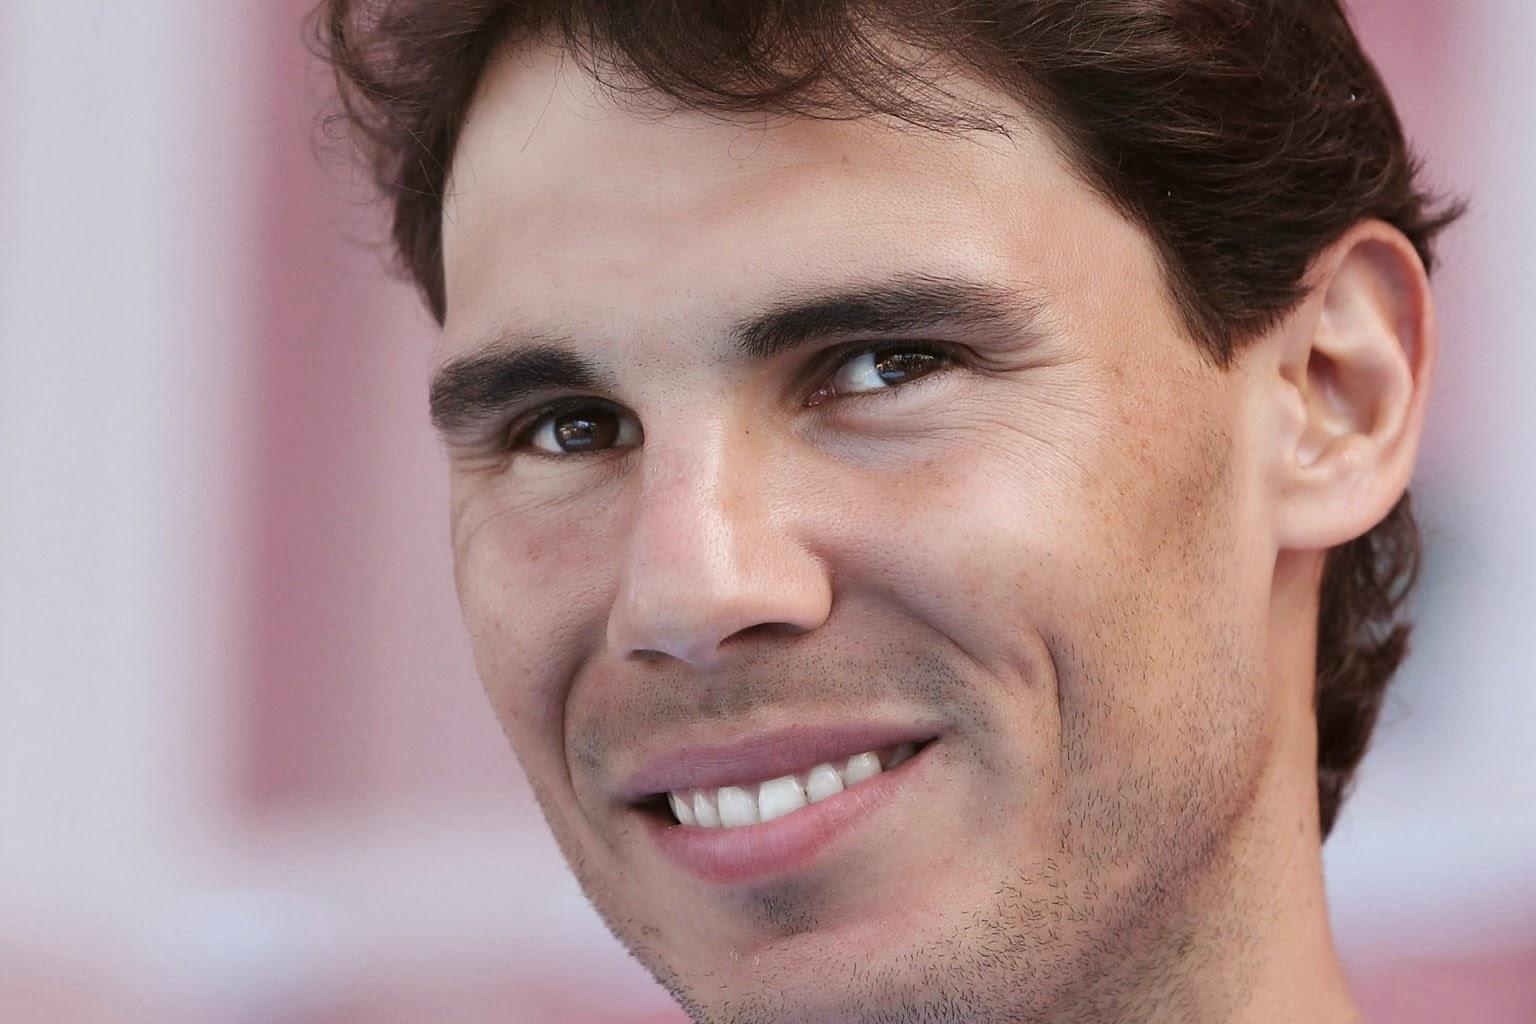 Rafa Nadal High Quality Images